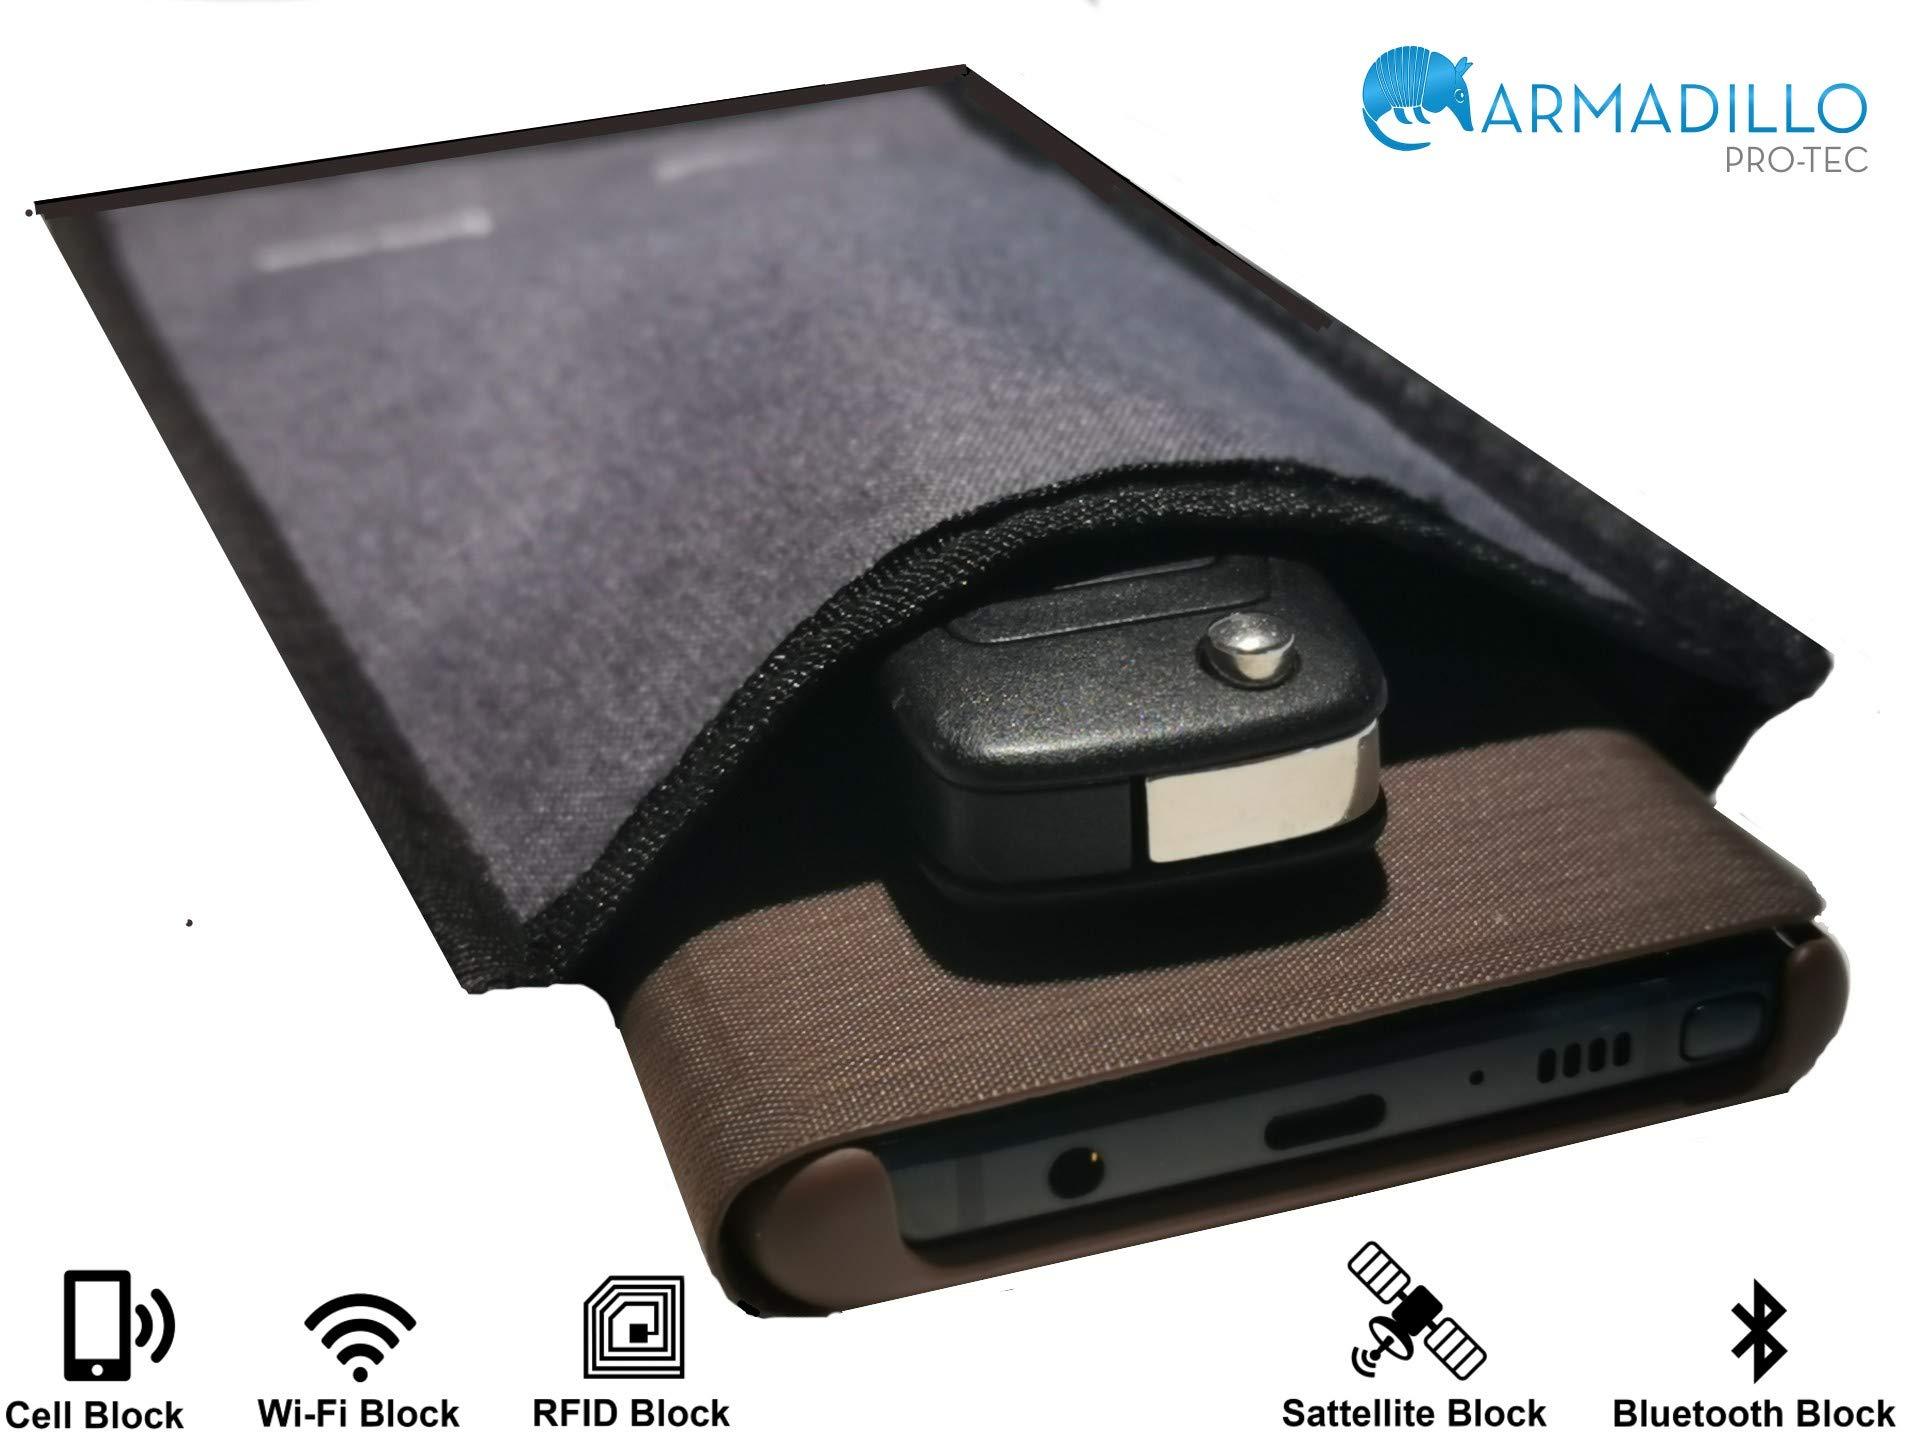 Armadillo Pro-Tec Faraday Bag Cell Phone & Car Key Fob Protector - RFID Signal Blocker and Faraday Cage - Anti-Car Theft, Anti-Hacking & Anti-Tracking by Armadillo Pro-Tec